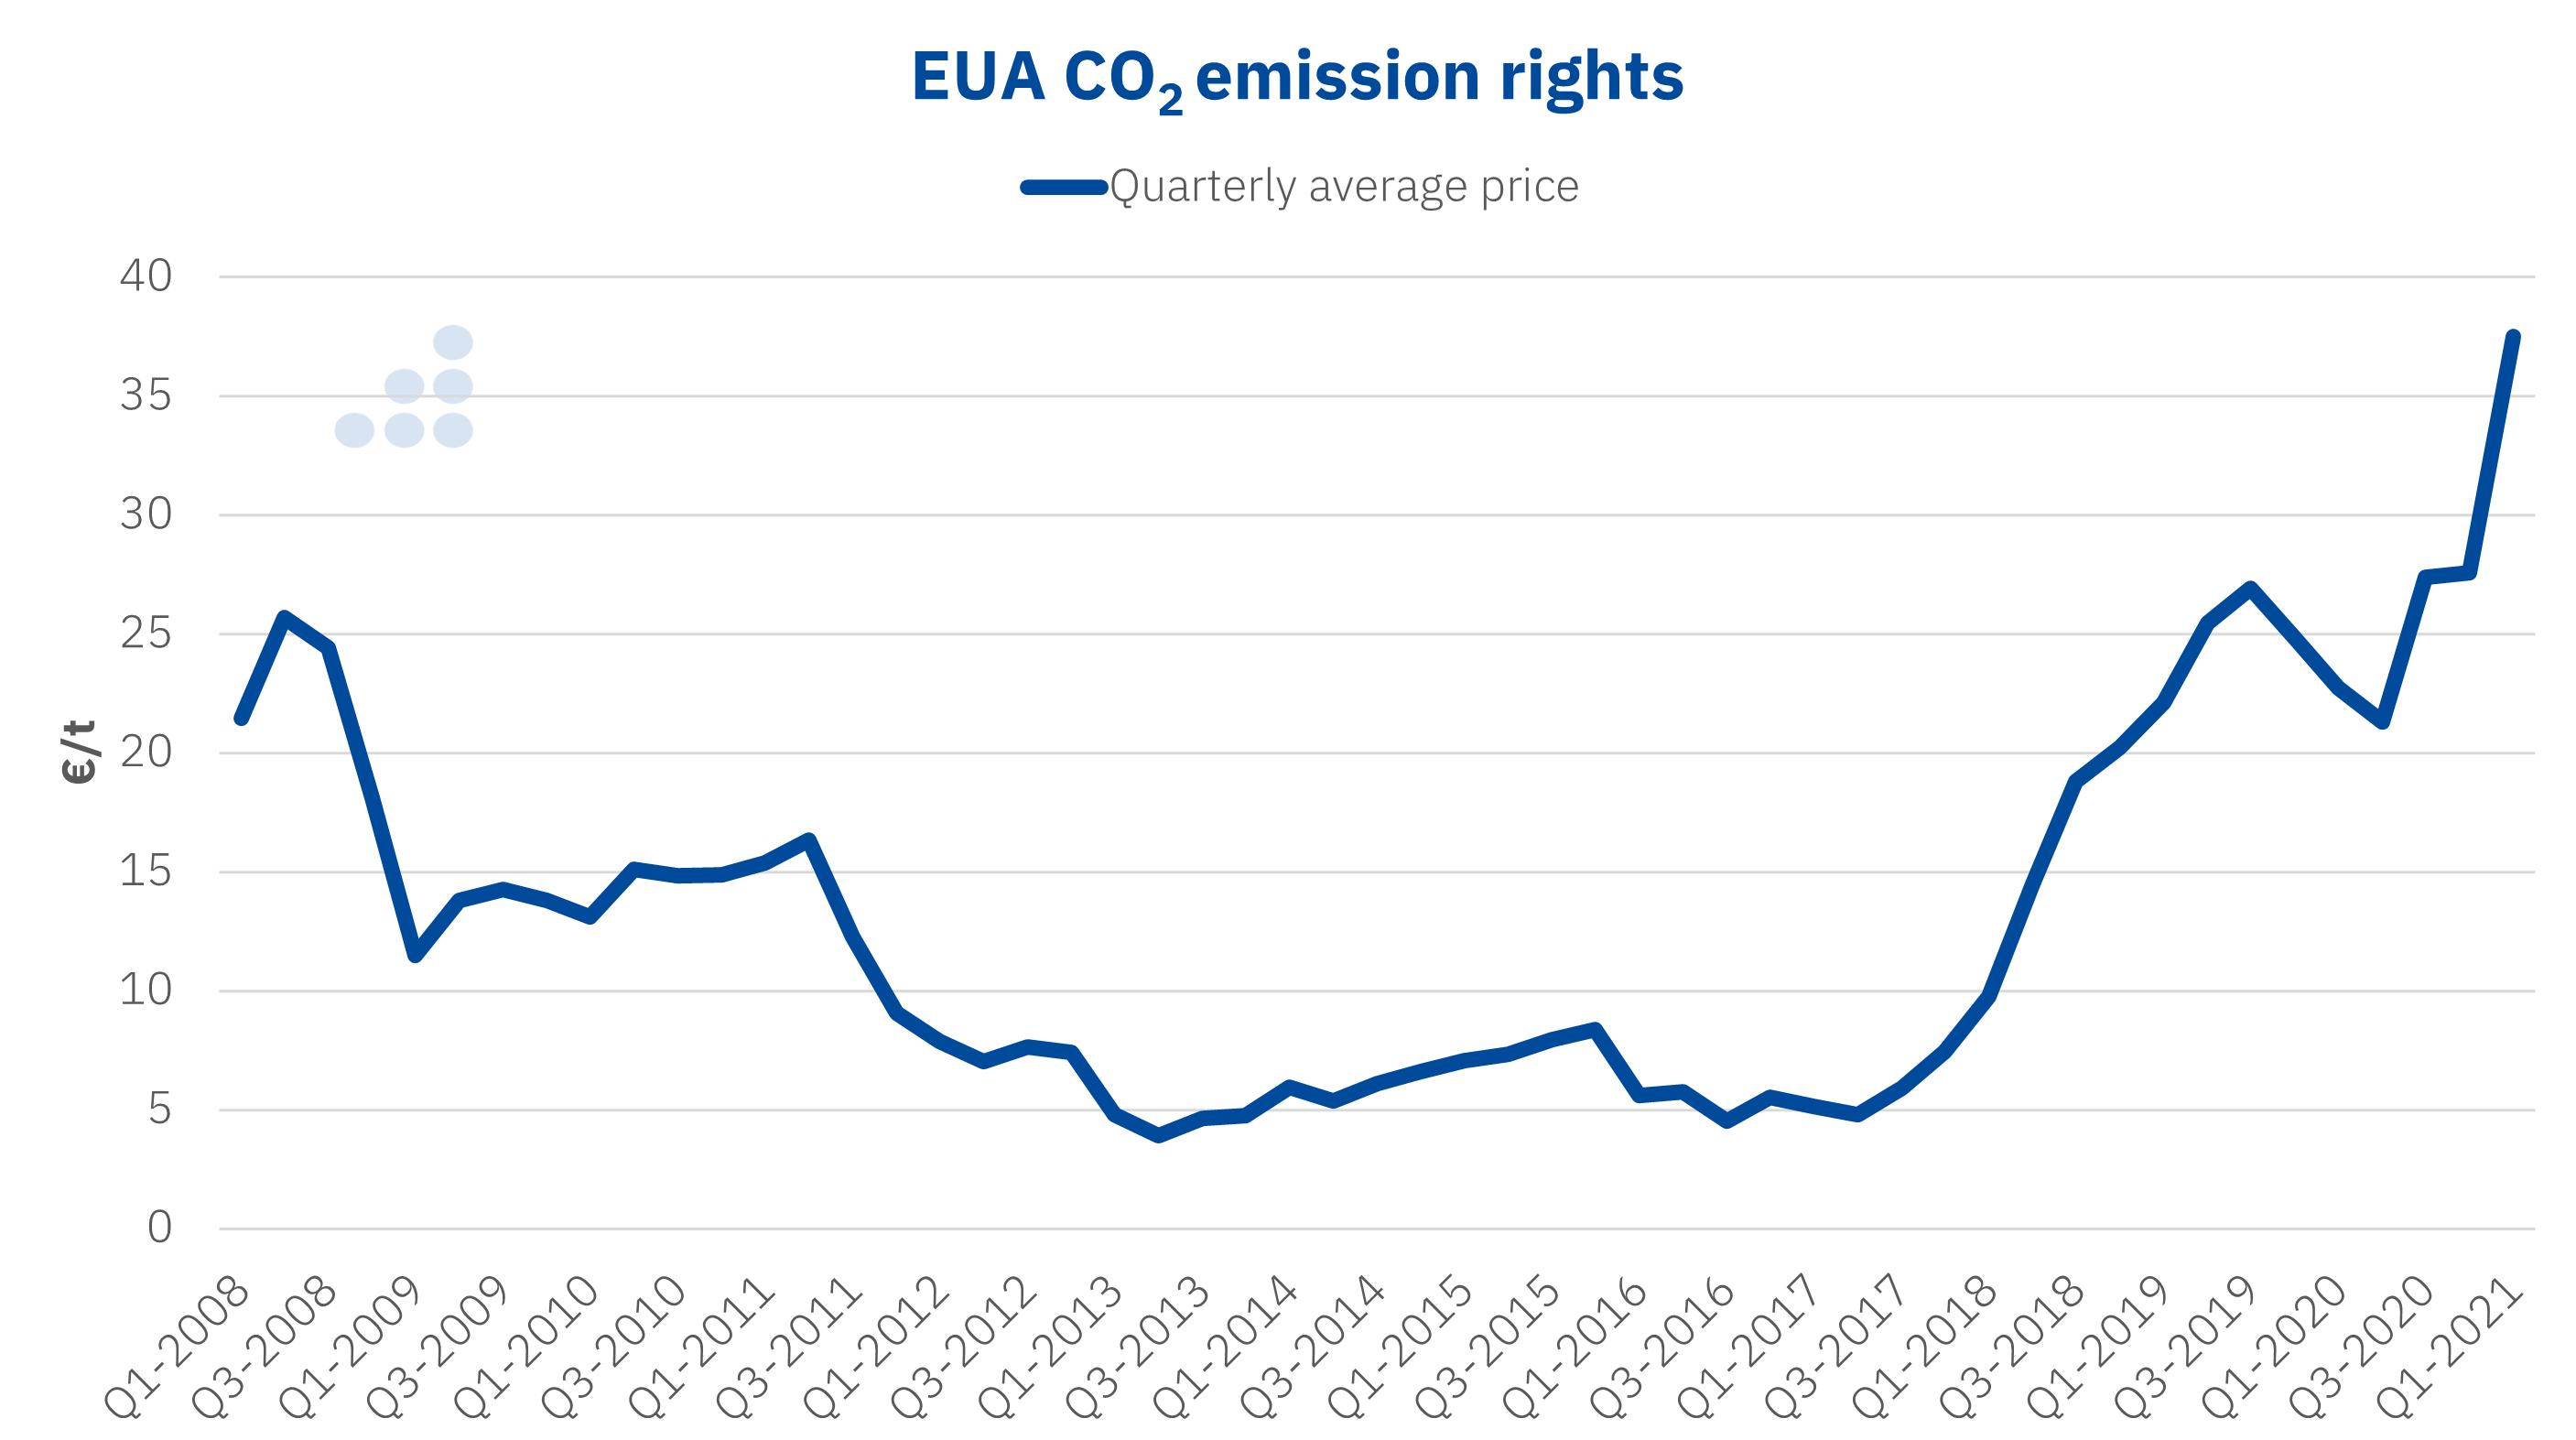 AleaSoft - Prices EUA CO2 emission rights